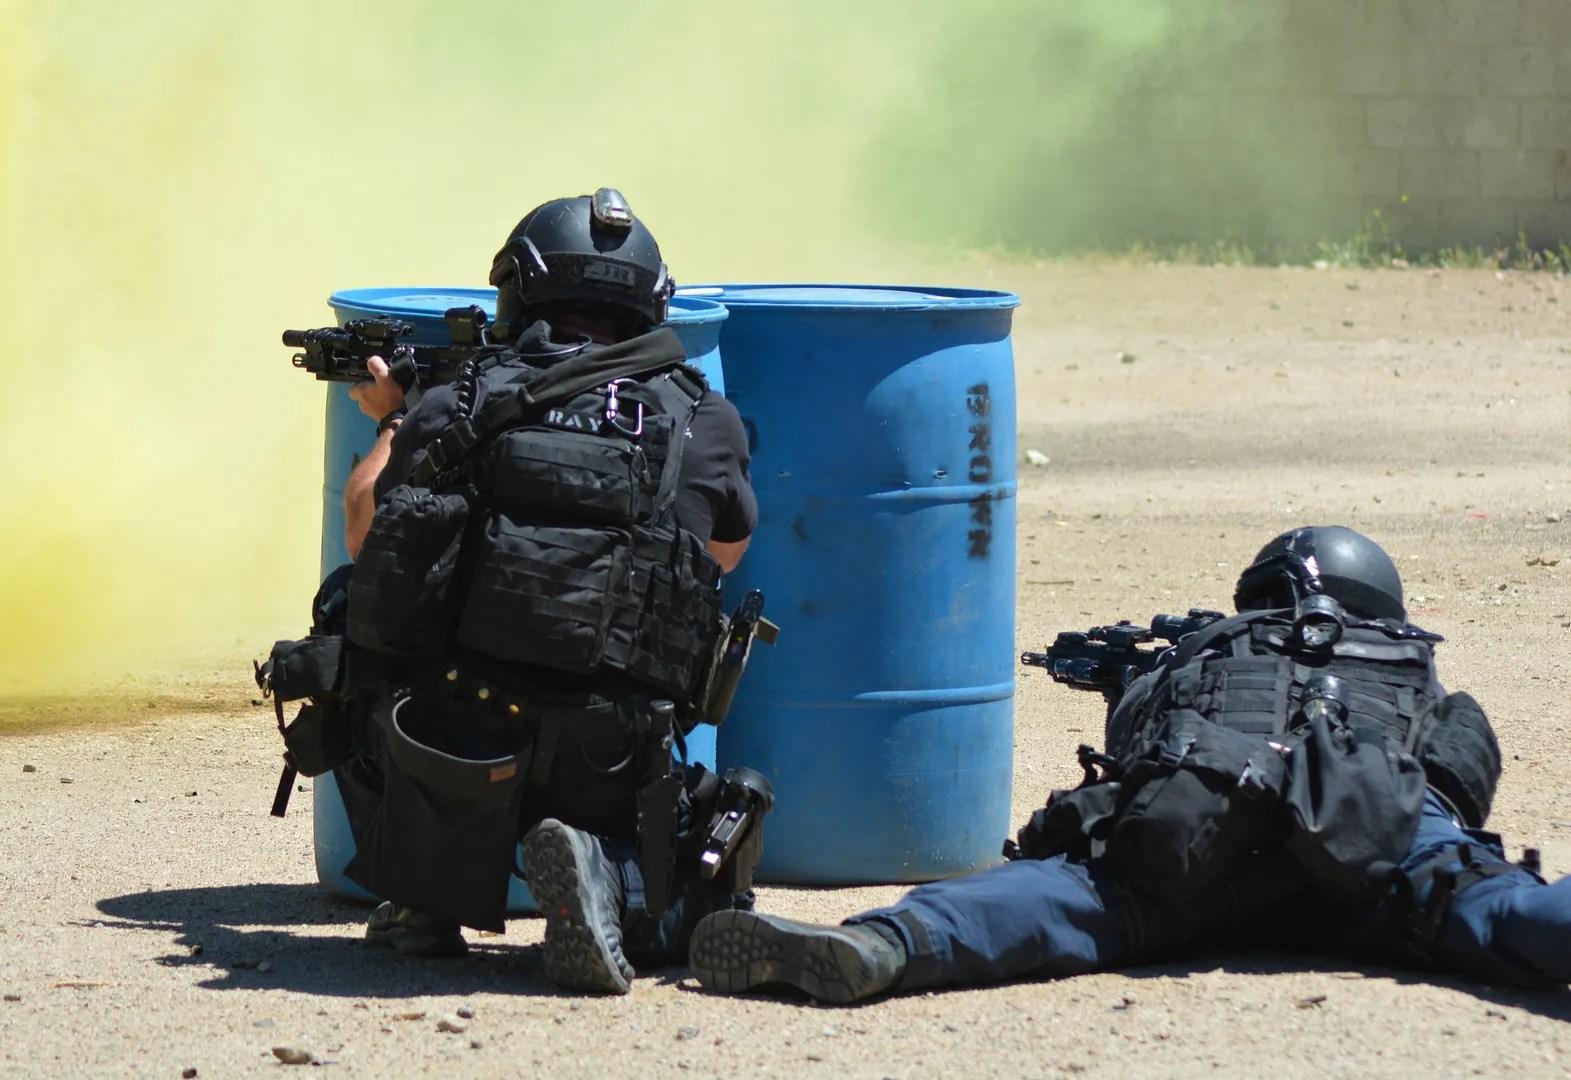 photo LAPD_SWAT_Exercise_10_zpsm7sstgqf.jpg